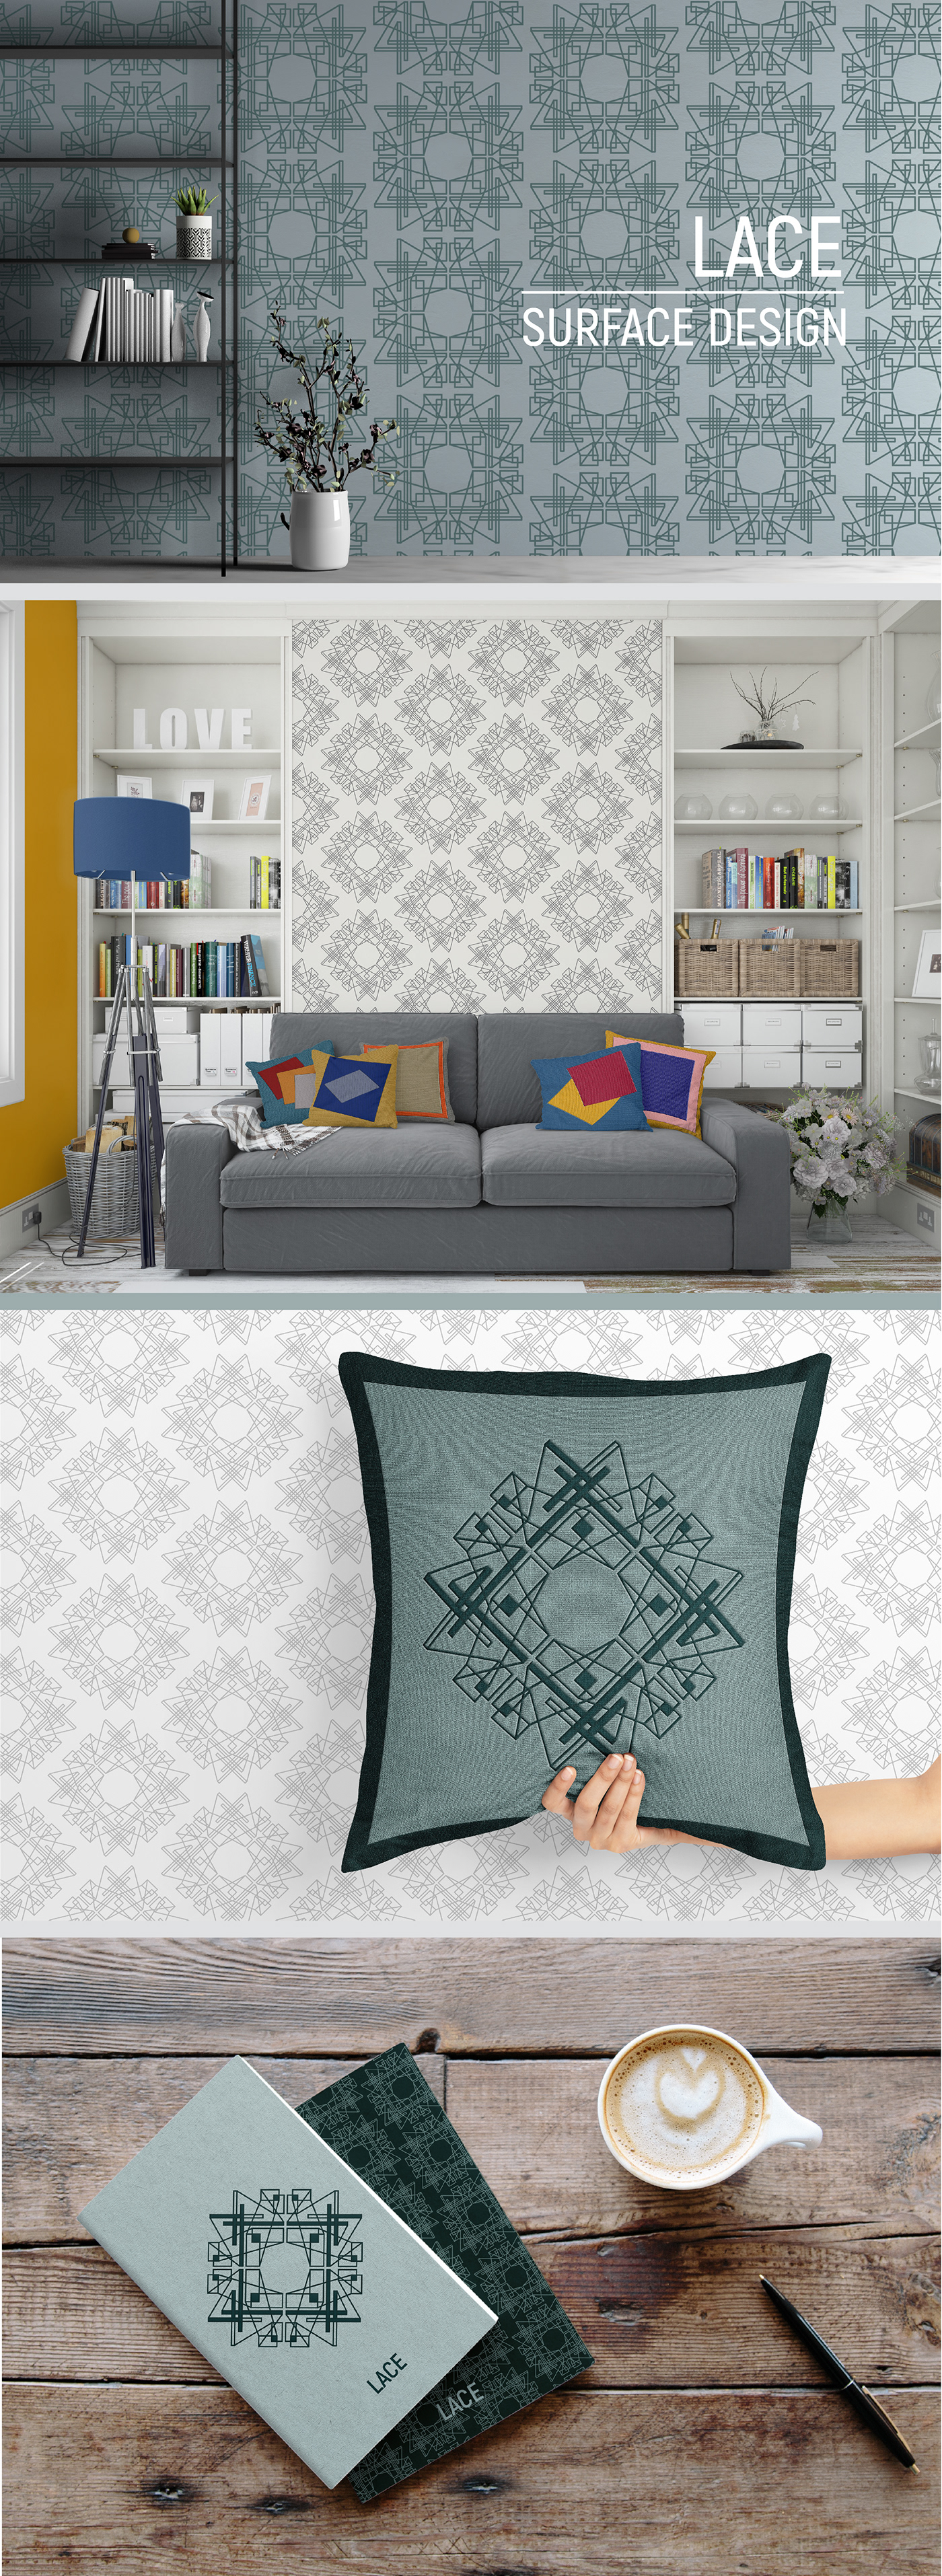 diseñodemotivos diseñodesuperficies geometricpatterns patterndesign surfacedesign surfacepatterndesign